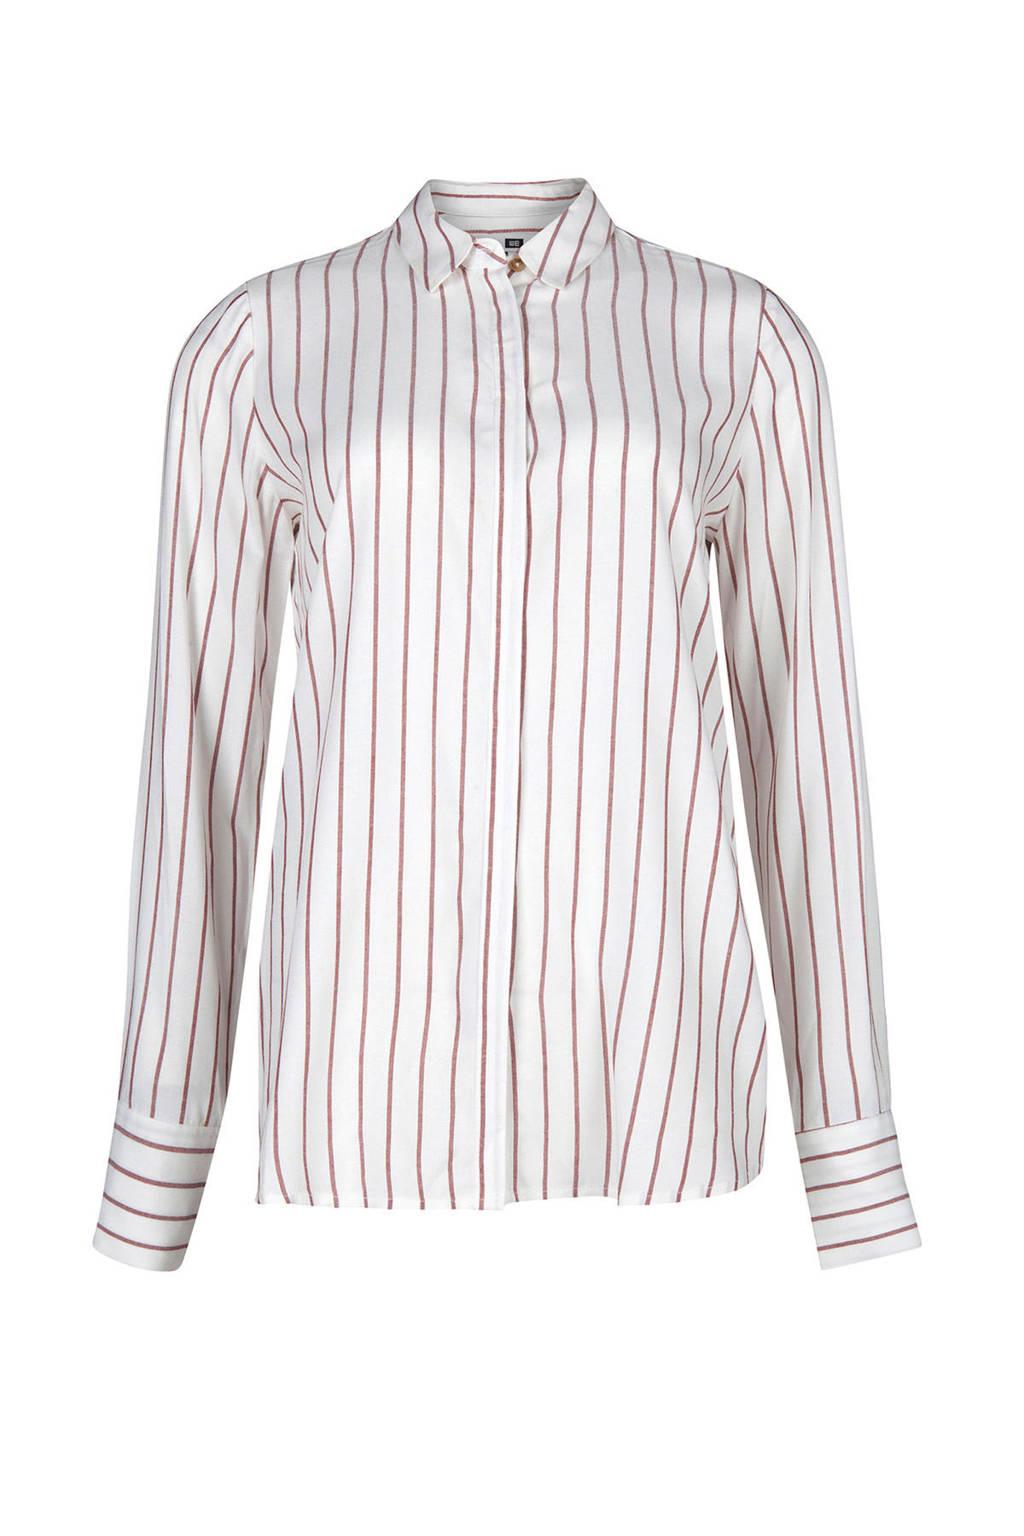 WE Fashion gestreepte blouse wit, Wit